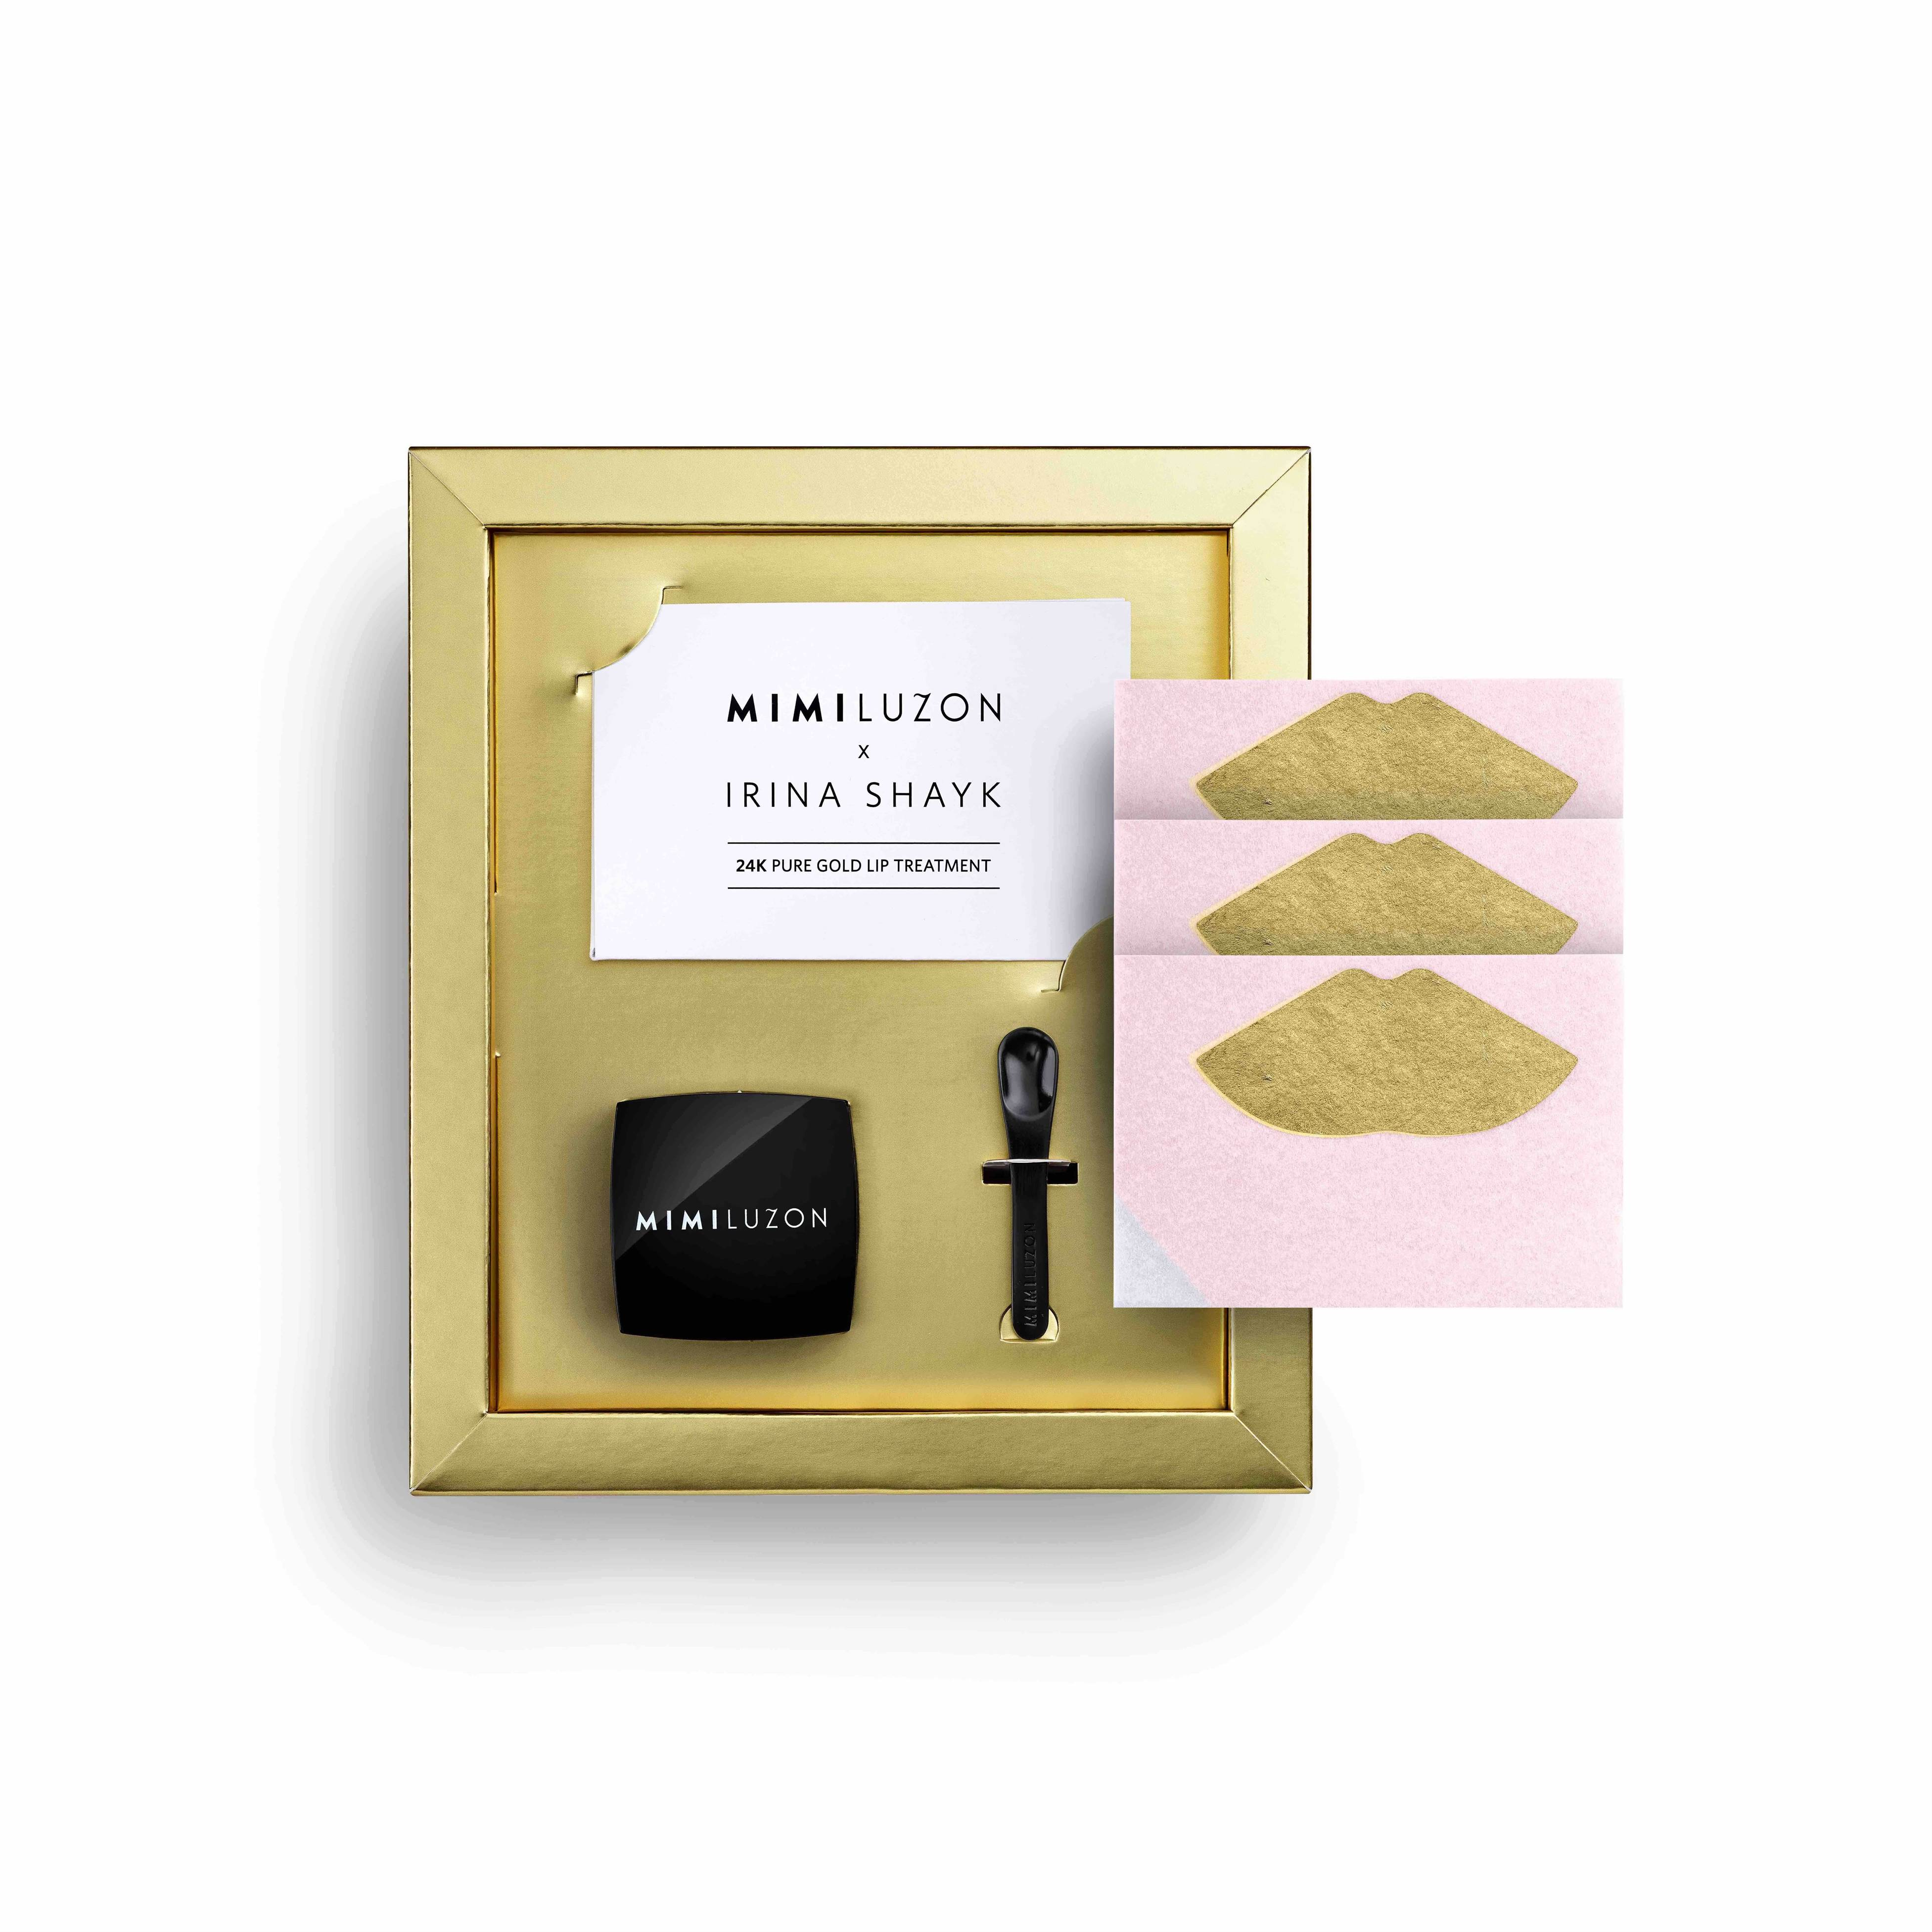 24K Pure Gold Lip Treatment